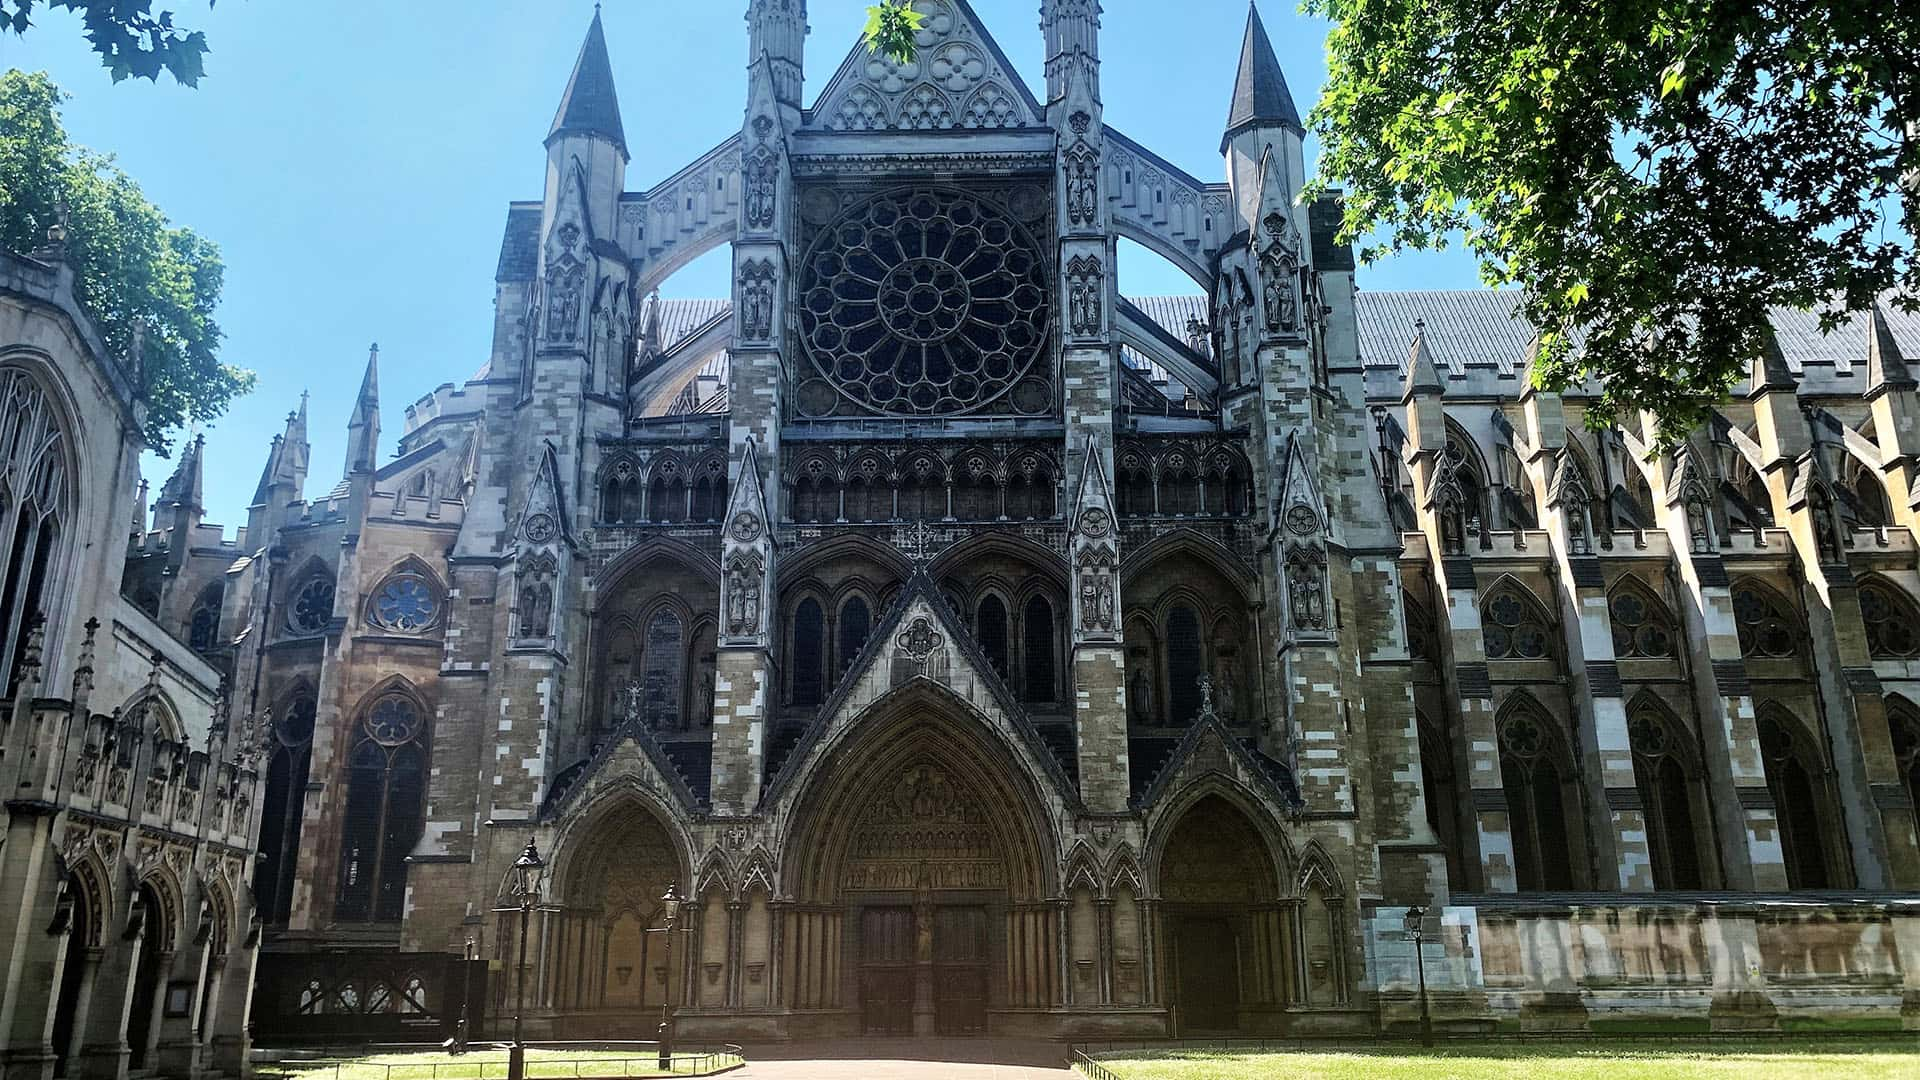 The British Royal Private Virtual Tour London